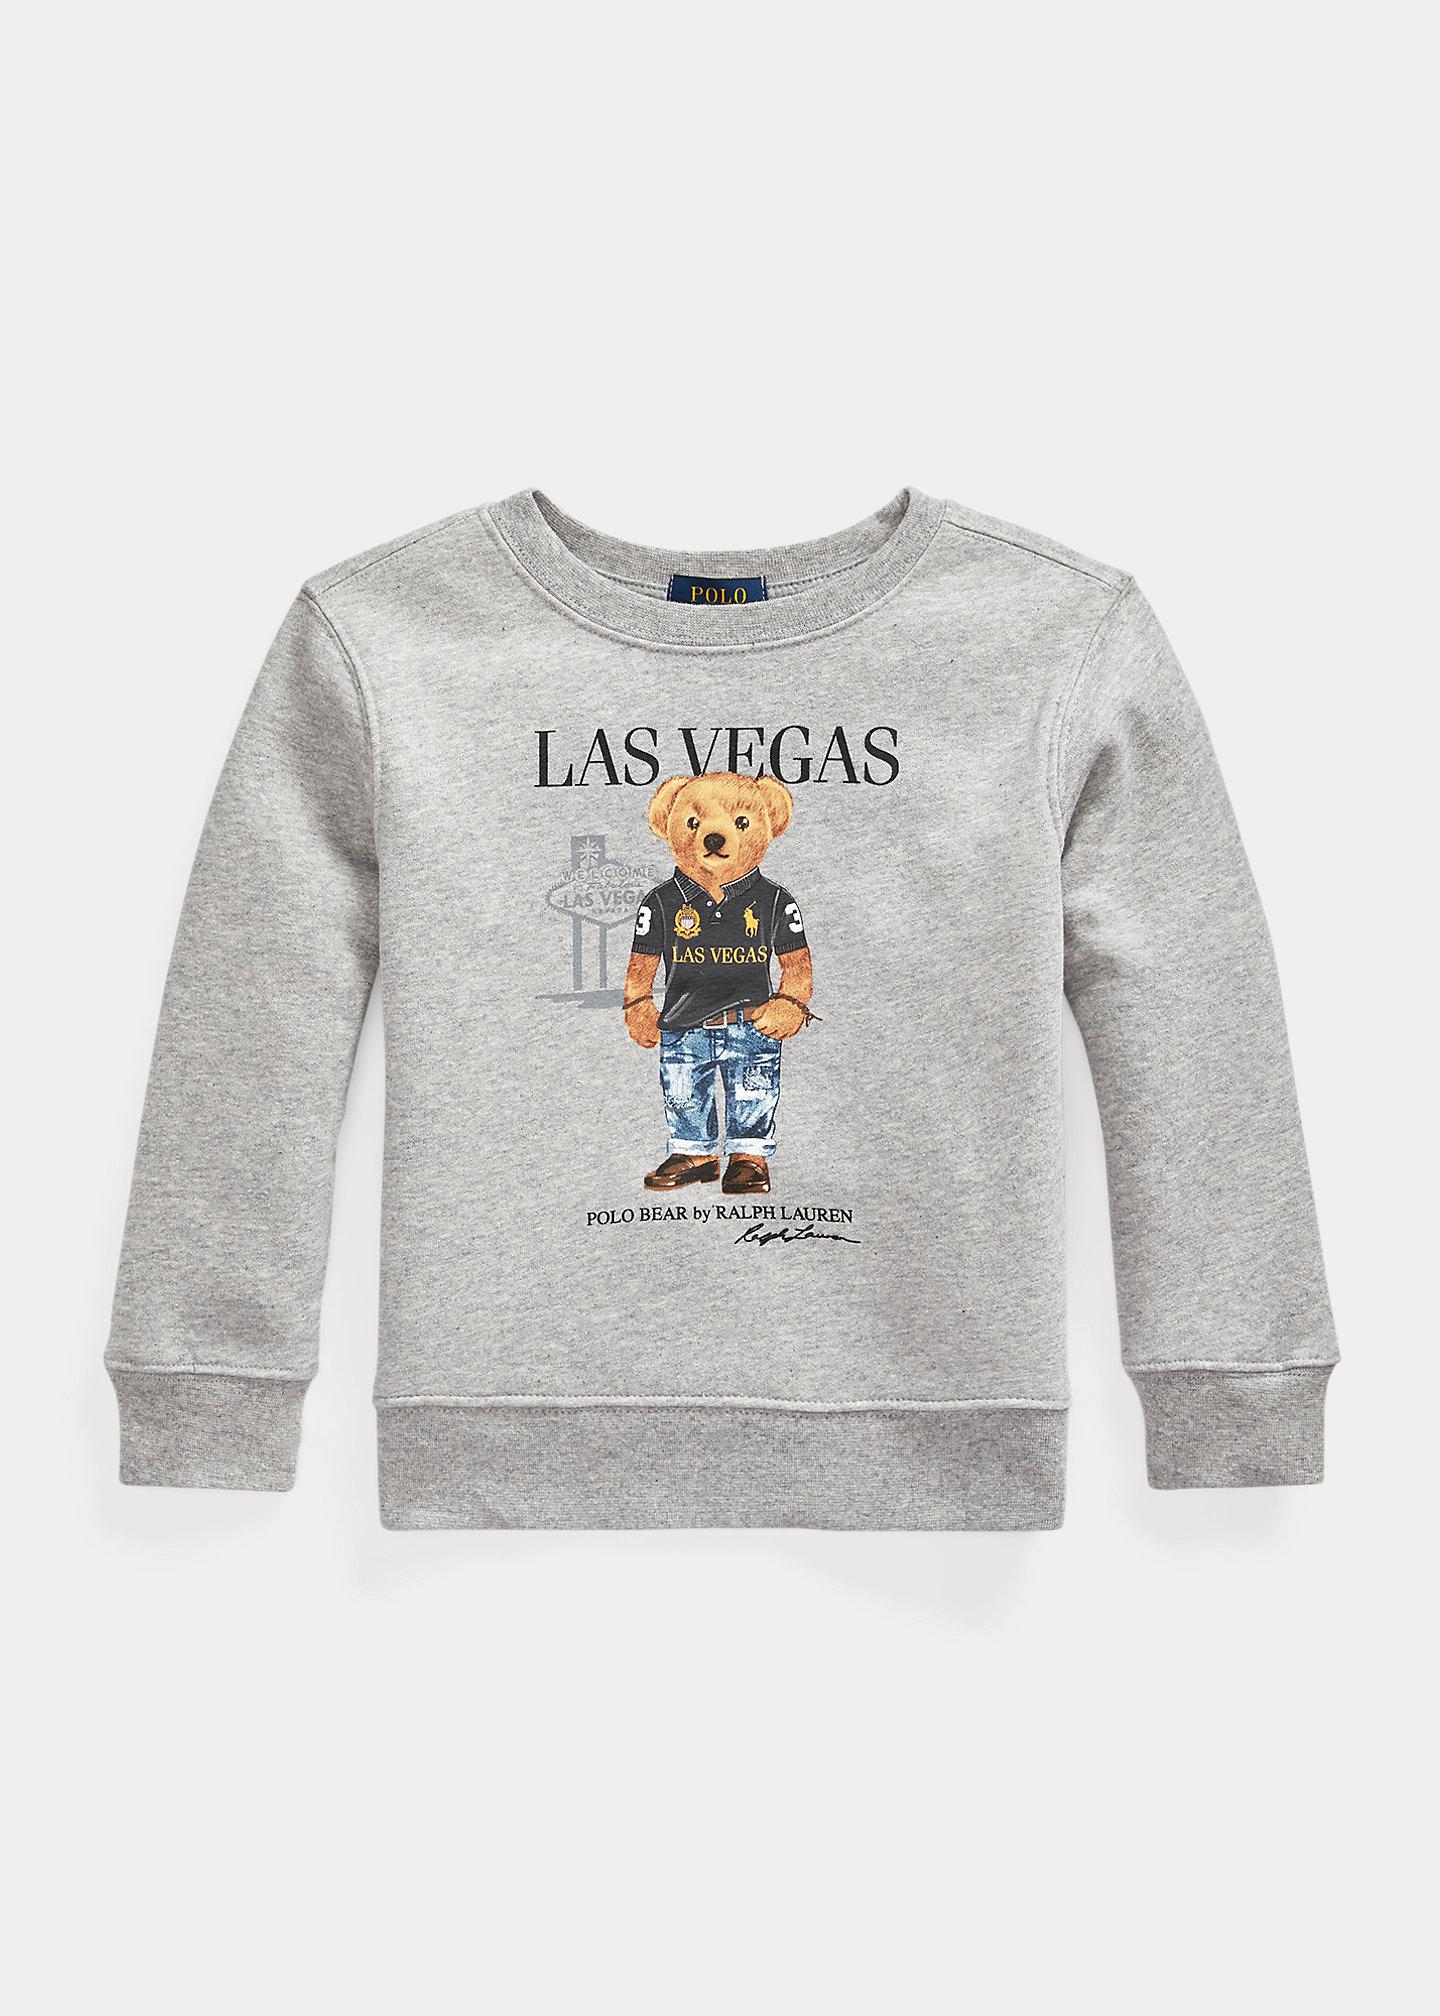 Polo Ralph Lauren Polo Bear Las Vegas Fleece Sweatshirt